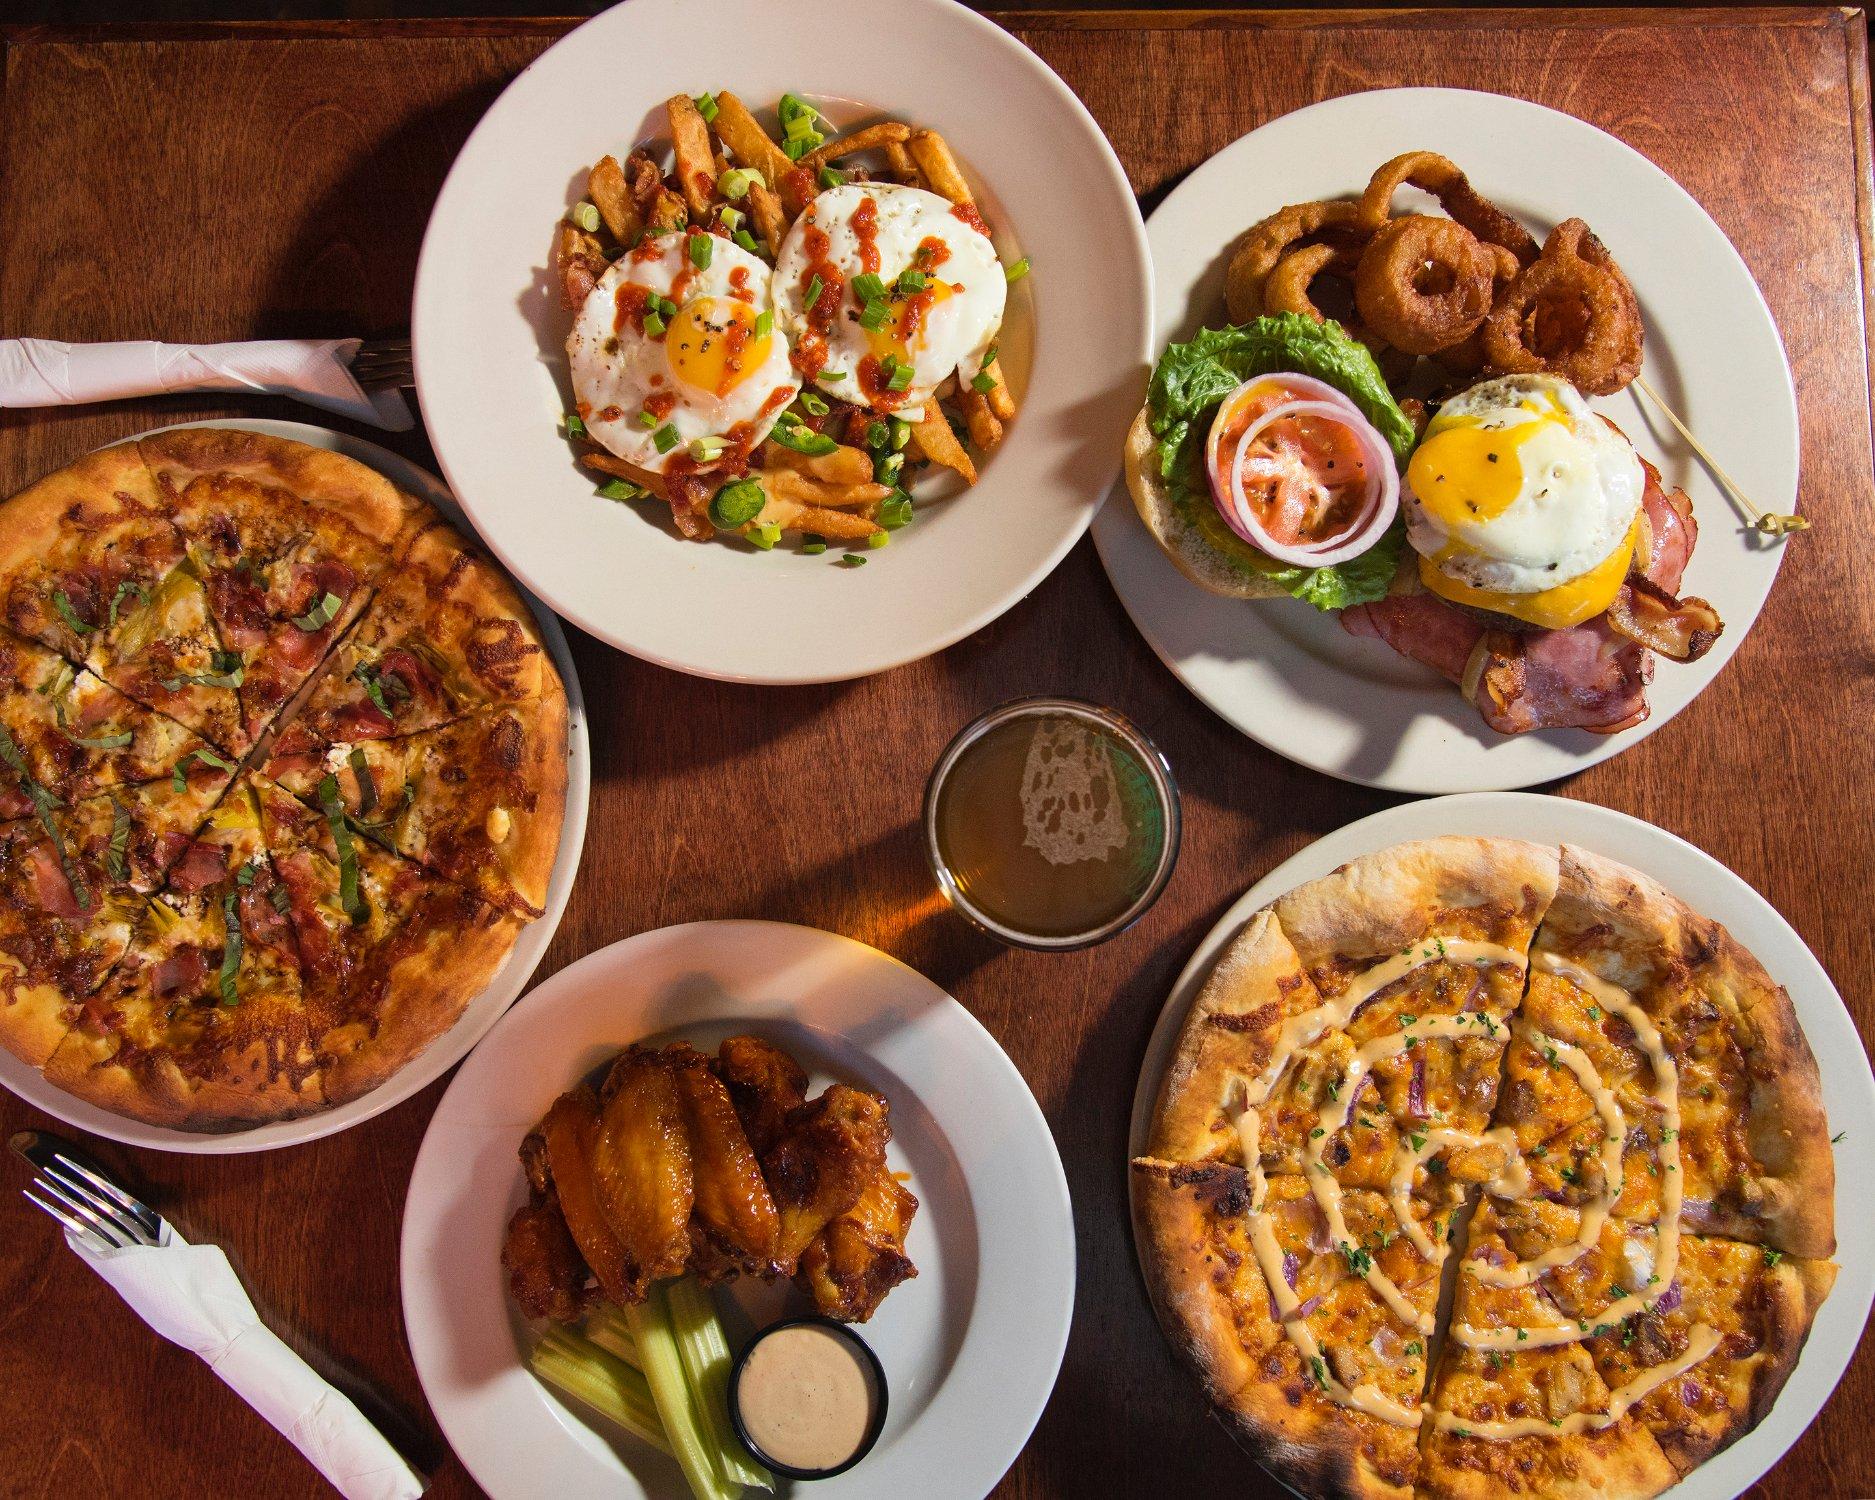 The 10 Best Restaurants Near Genesee River\'s High Falls - TripAdvisor